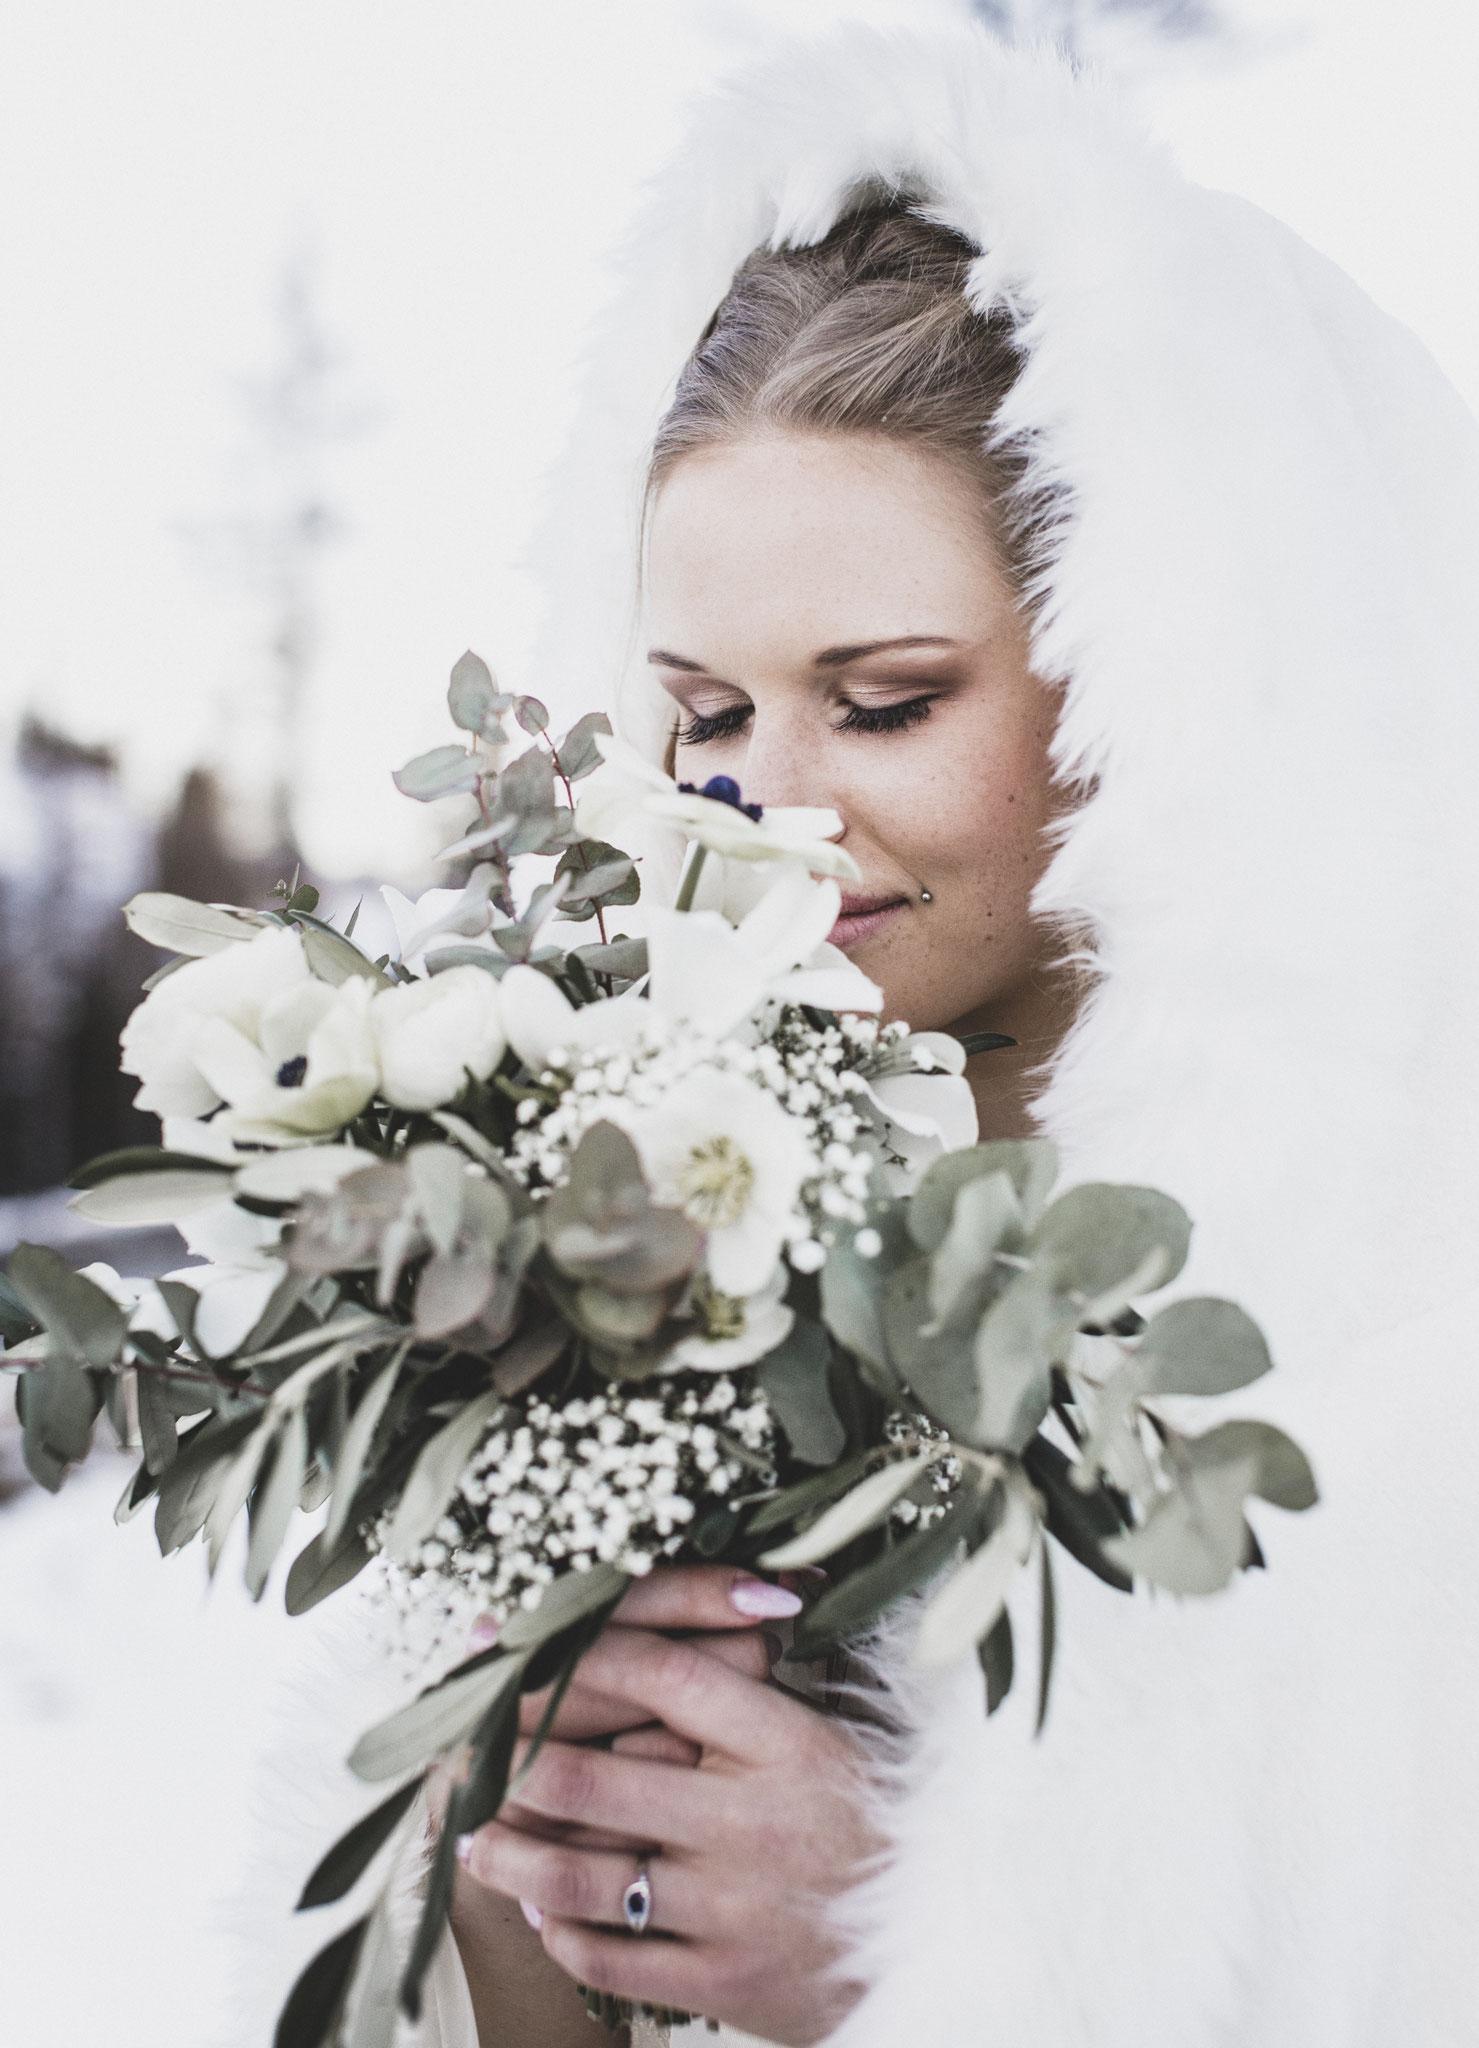 Nadine & Marcel  - Winter Wedding, Hotel Pierer